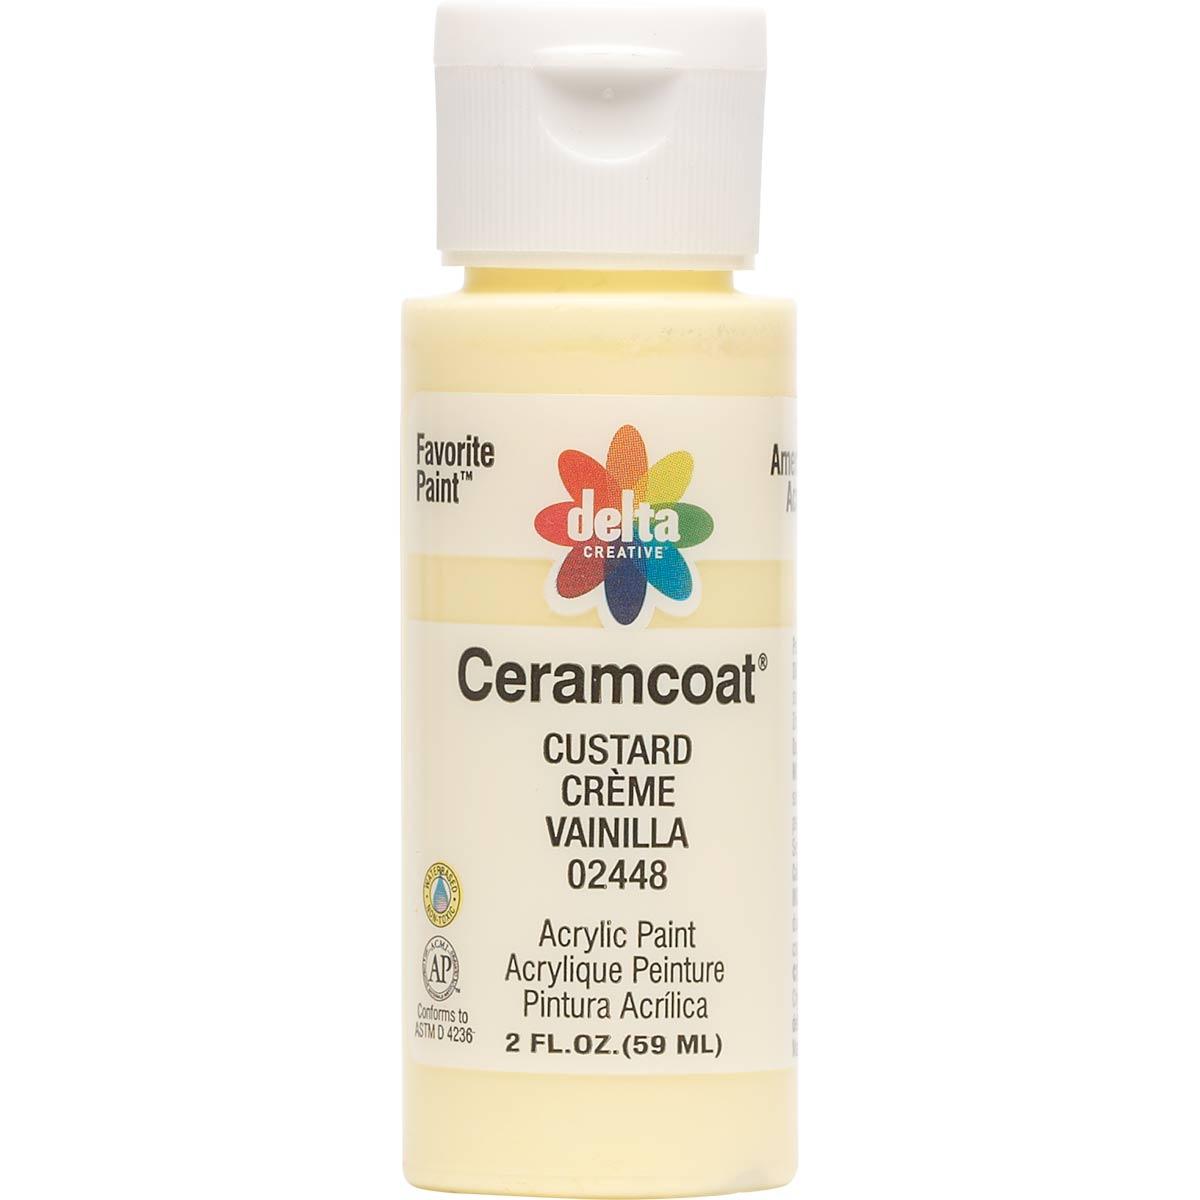 Delta Ceramcoat ® Acrylic Paint - Custard, 2 oz.